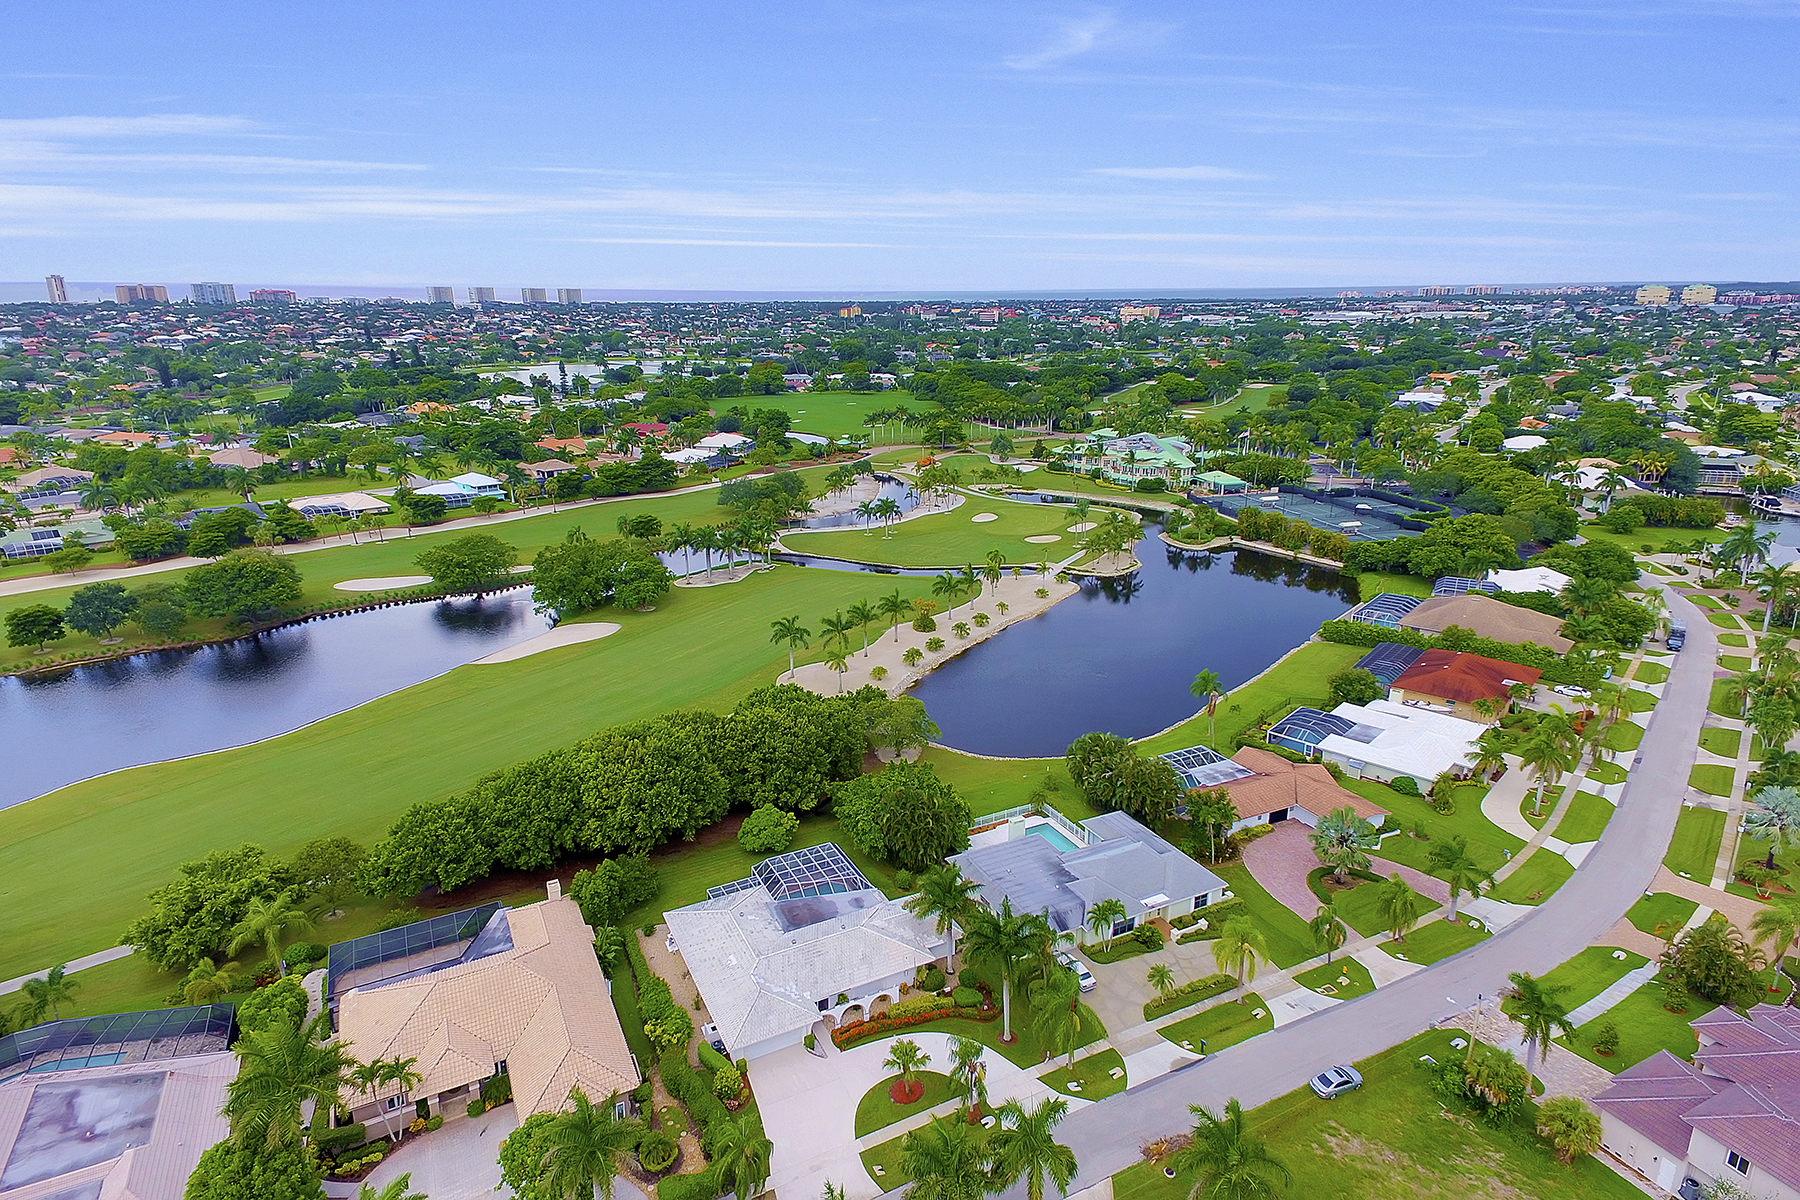 Single Family Home for Sale at MARCO ISLAND - NASSAU COURT 404 Nassau Ct Marco Island, Florida, 34145 United States